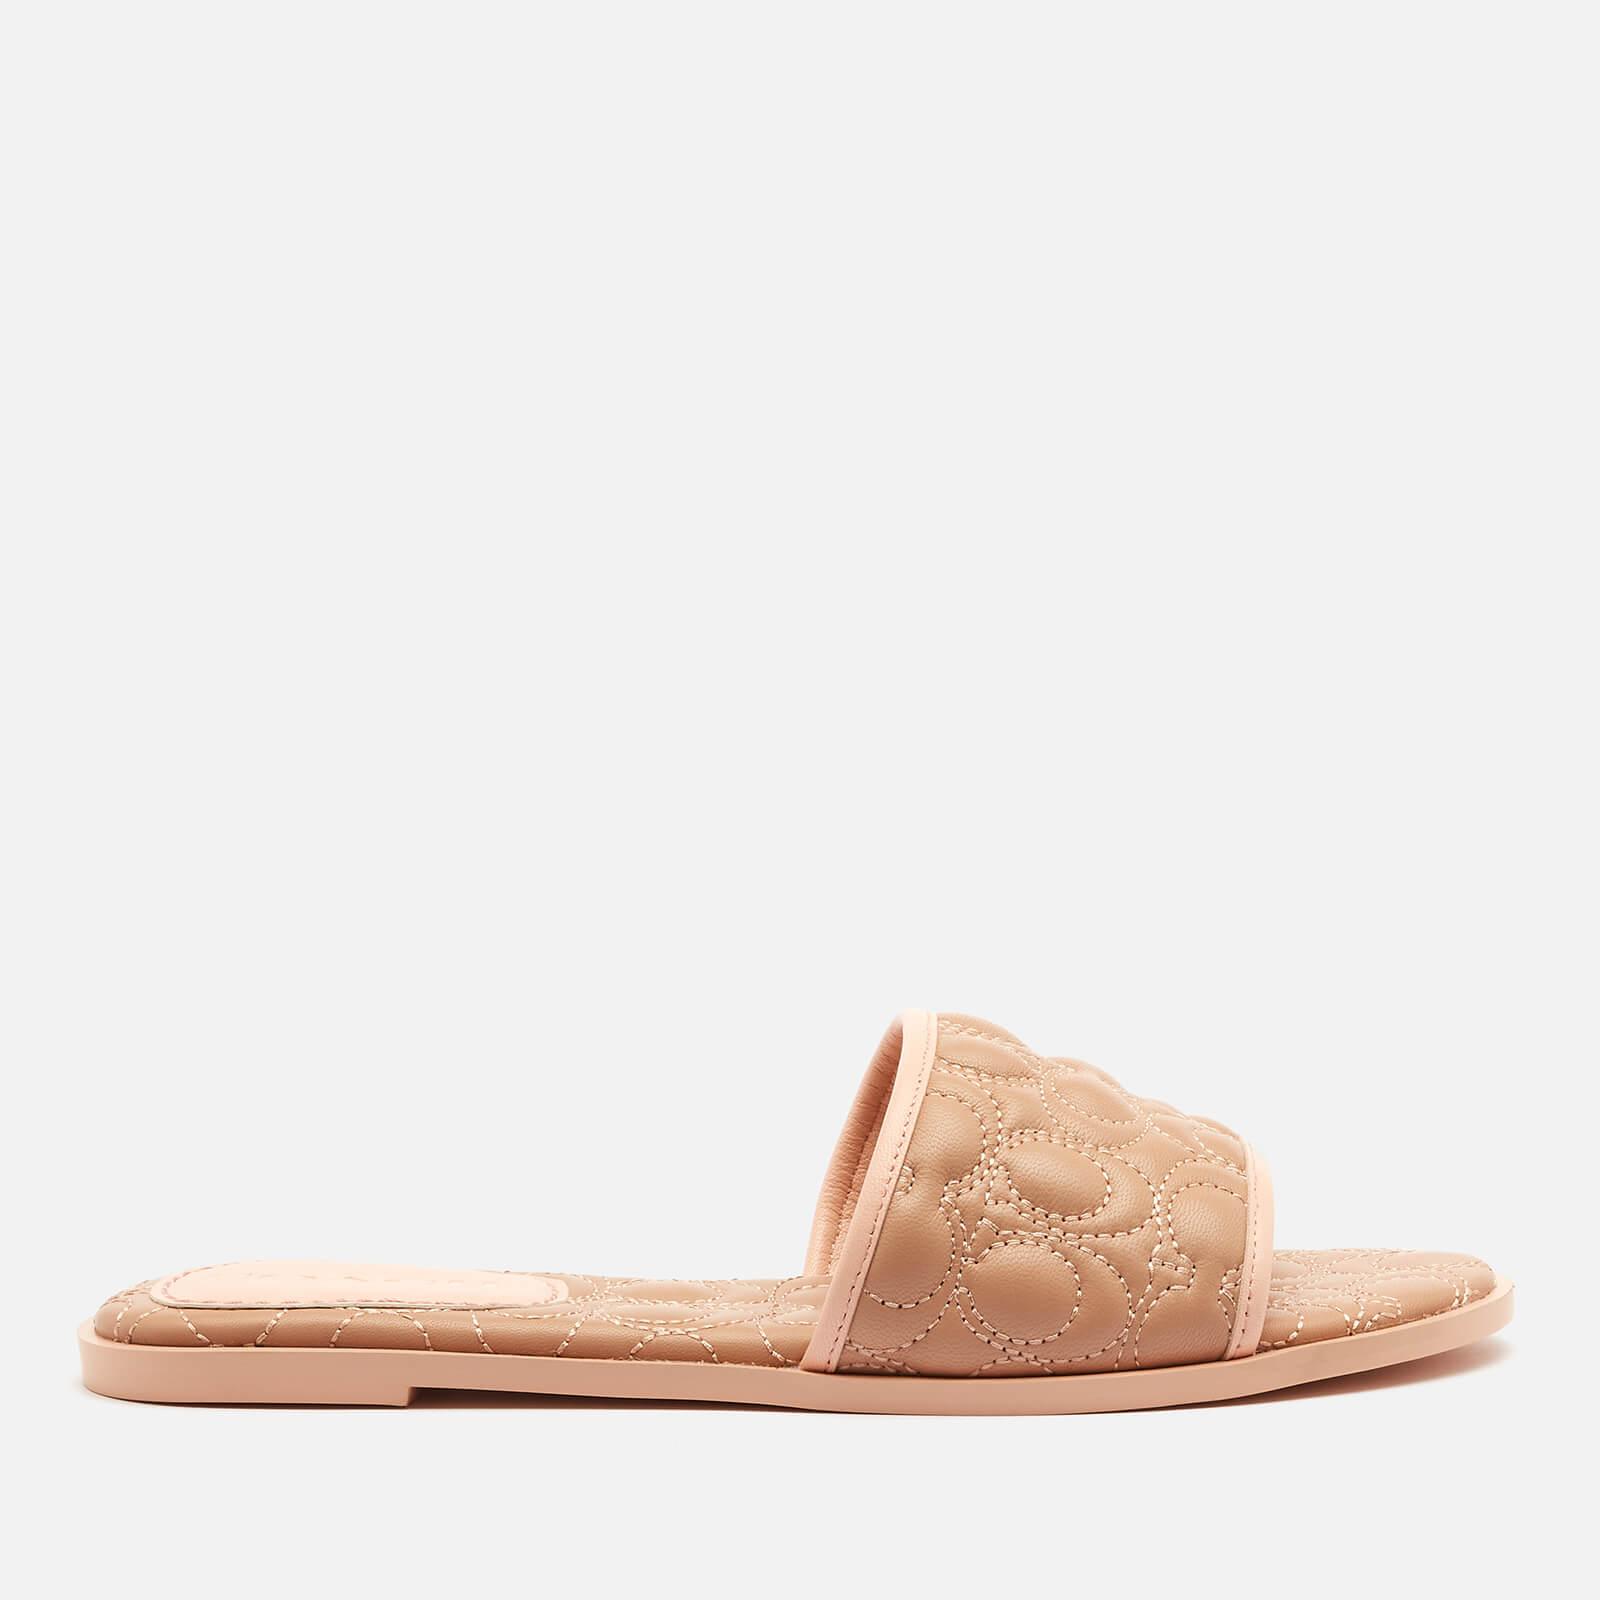 Coach Women's Olivea Quilted Leather Slide Sandals - Beechwood - Uk 3